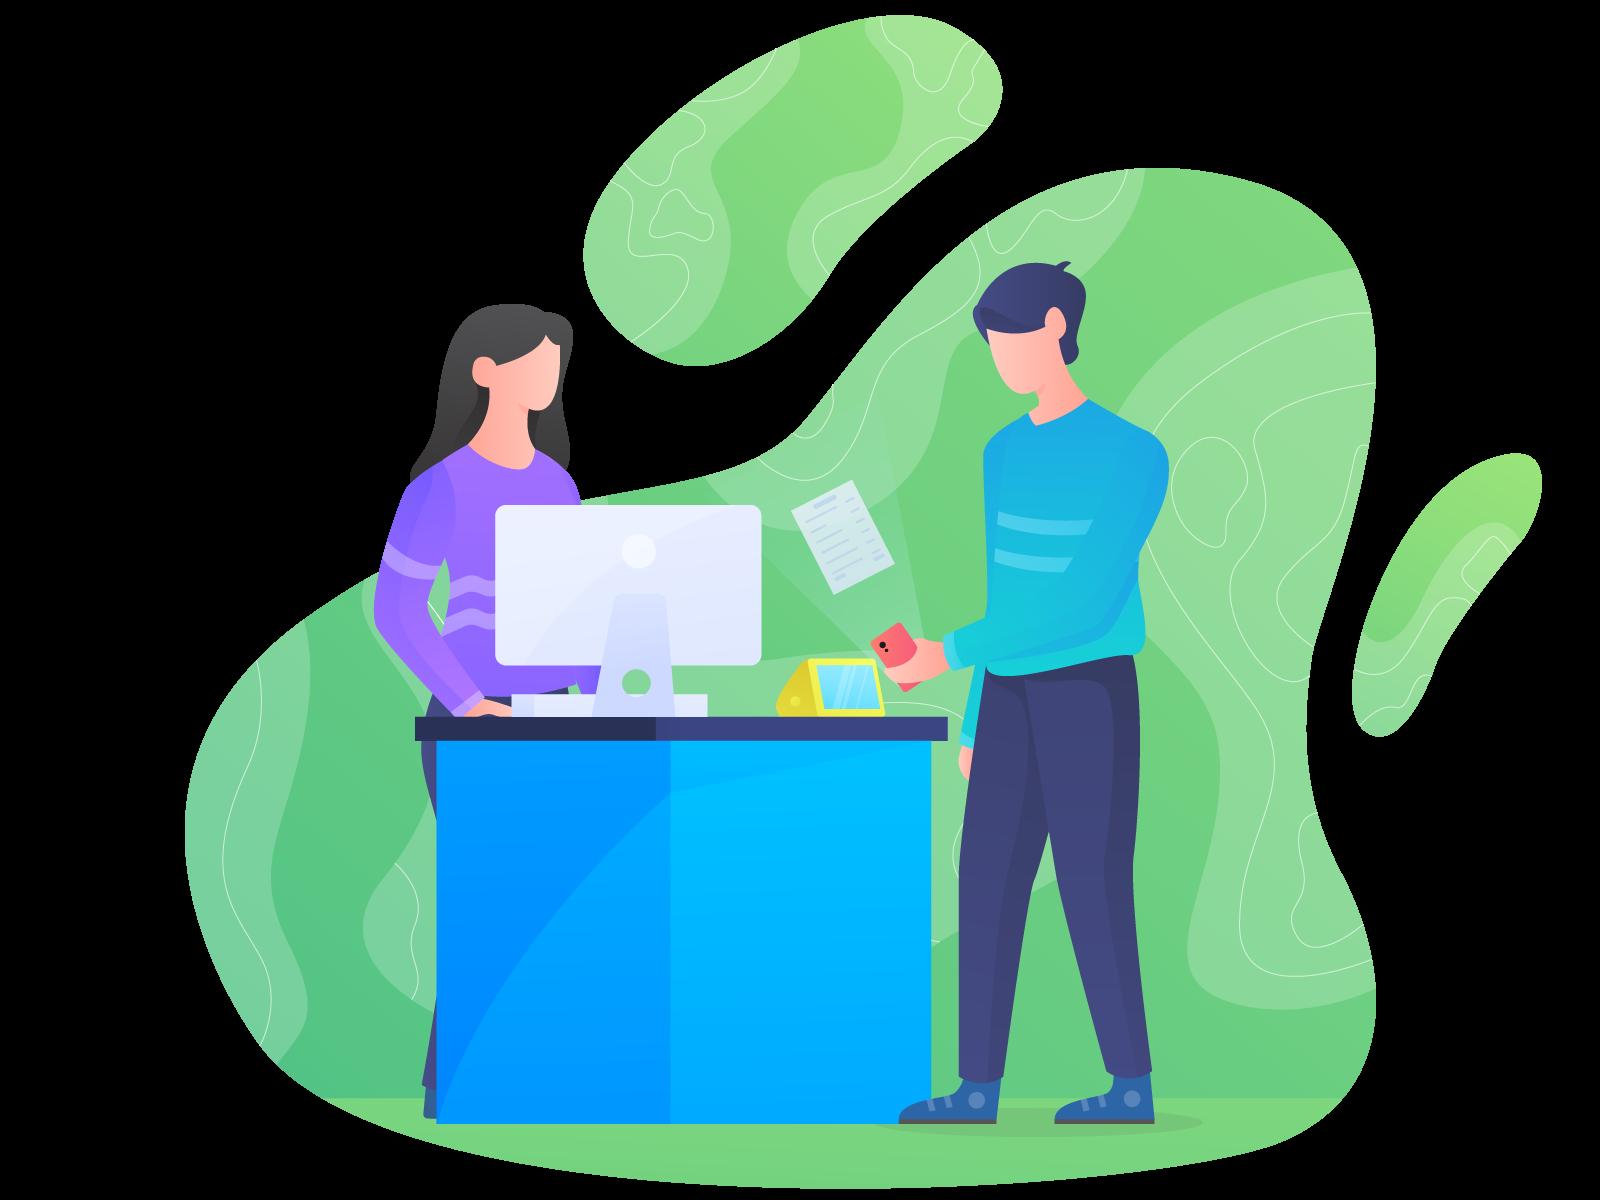 Retailer illustration